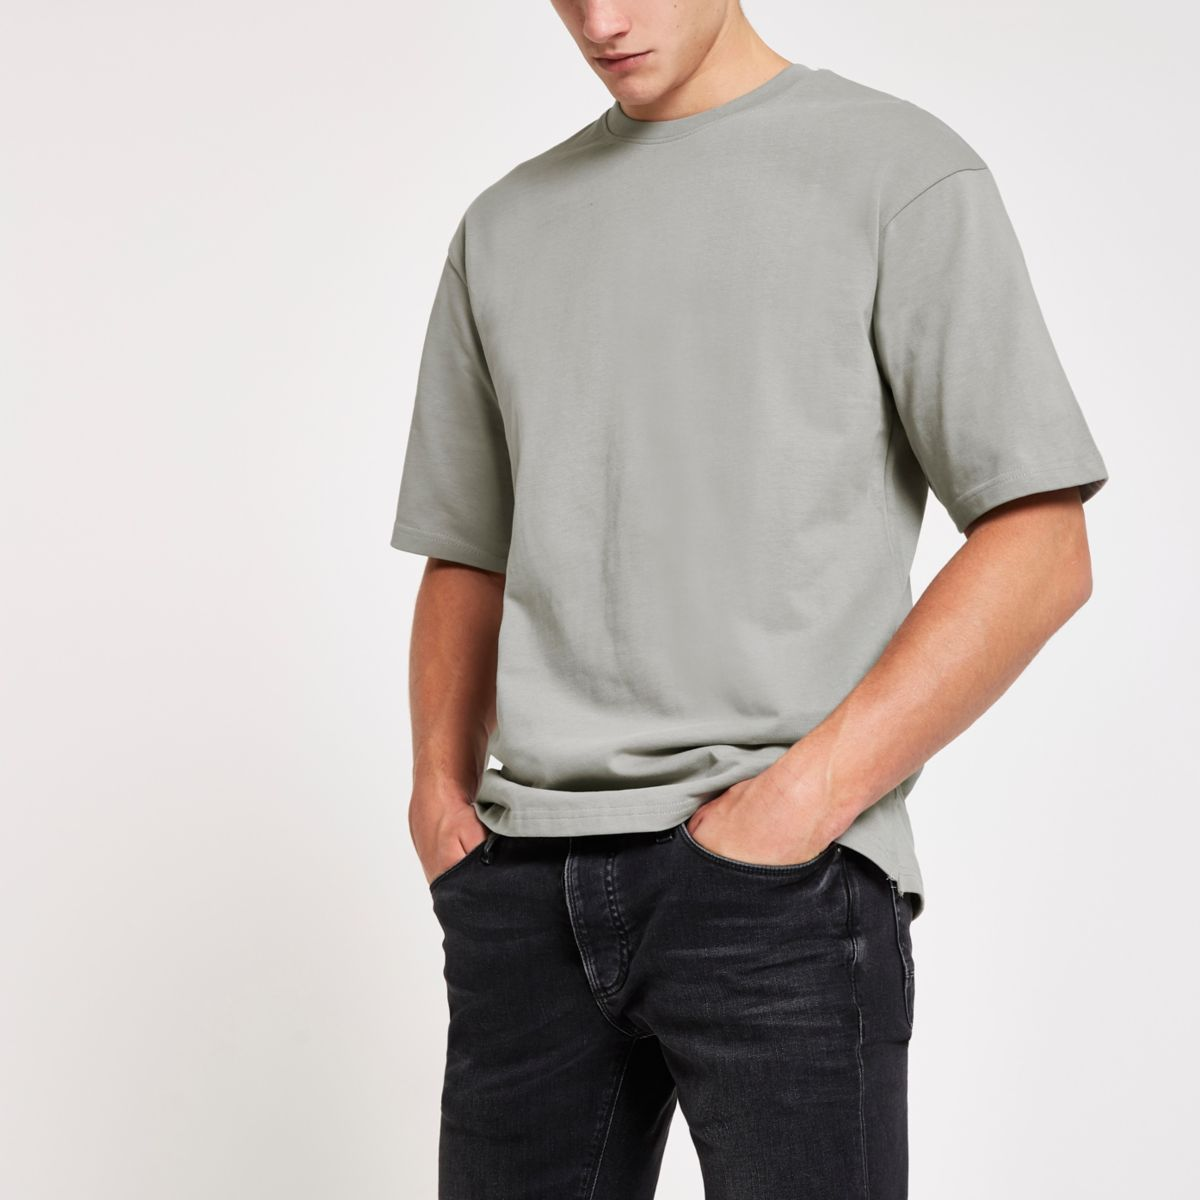 Only & Sons grey short sleeve sweatshirt